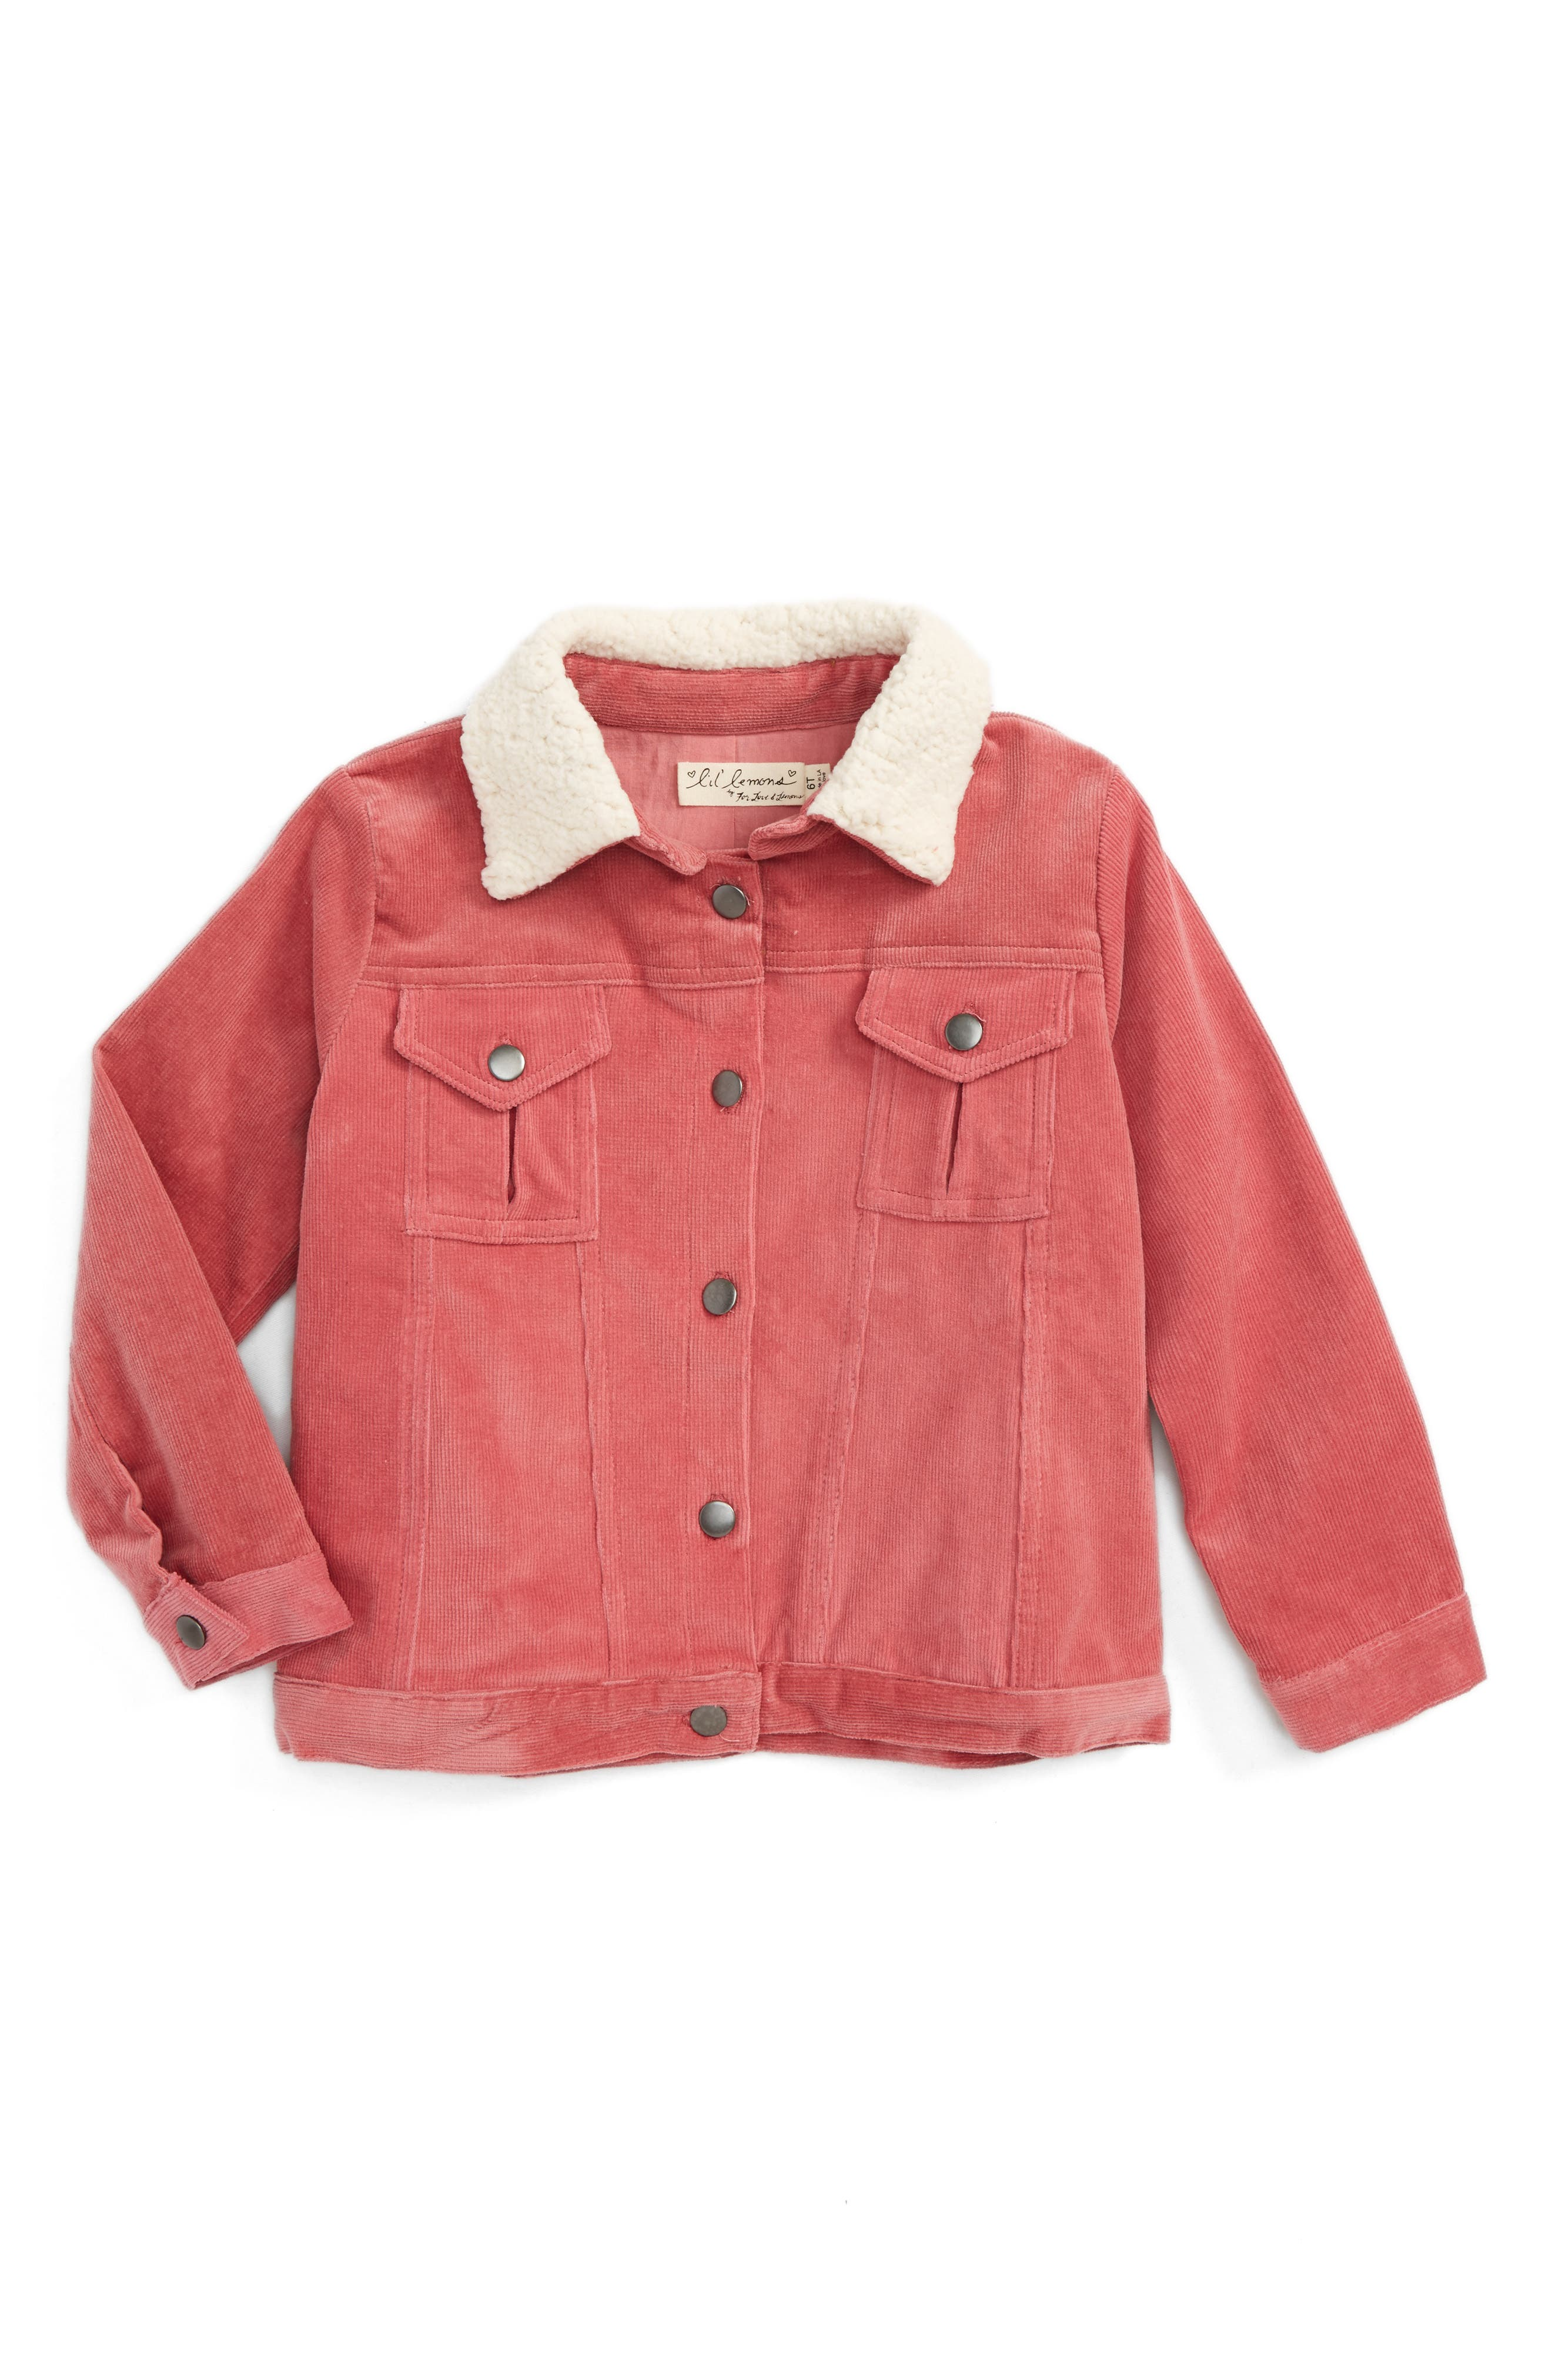 Corduroy Jacket,                         Main,                         color, Rose Pink